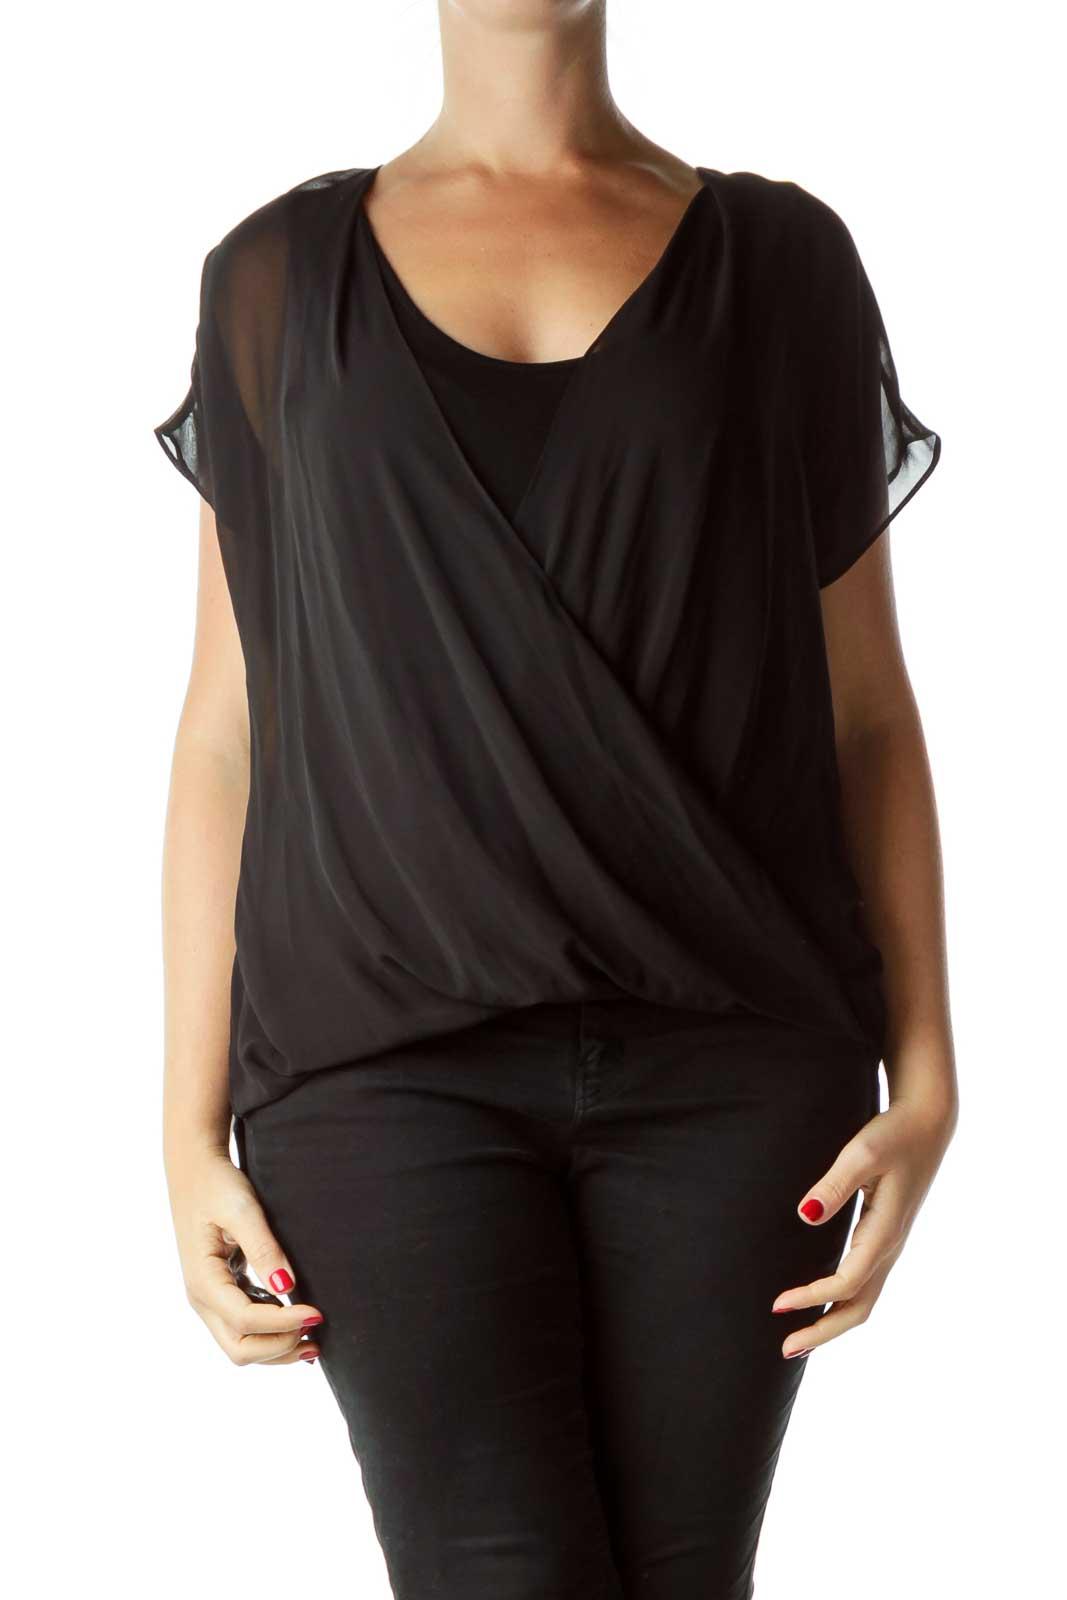 Black Sleeveless Blouse with Sheer Detail